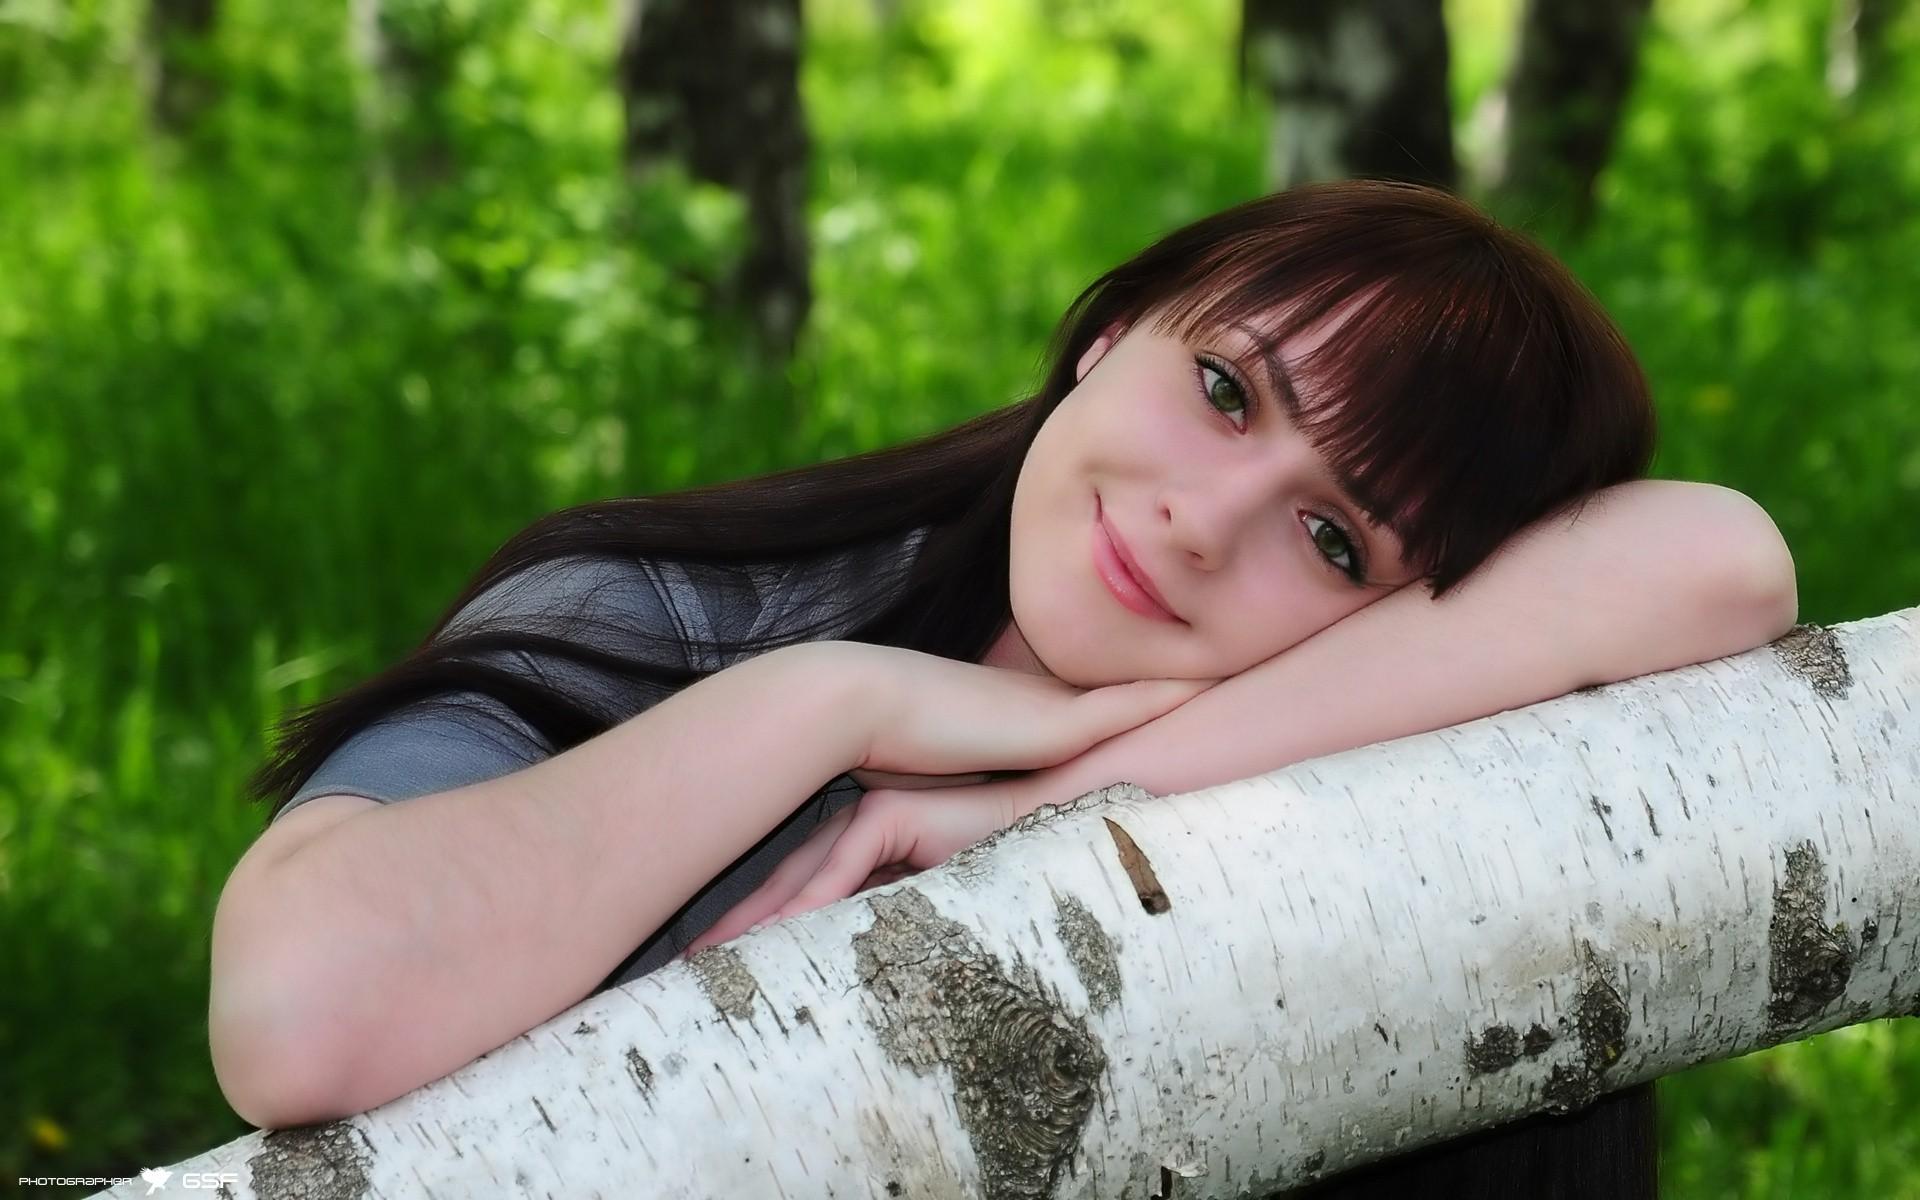 Chica japonesa sonriendo - 1920x1200